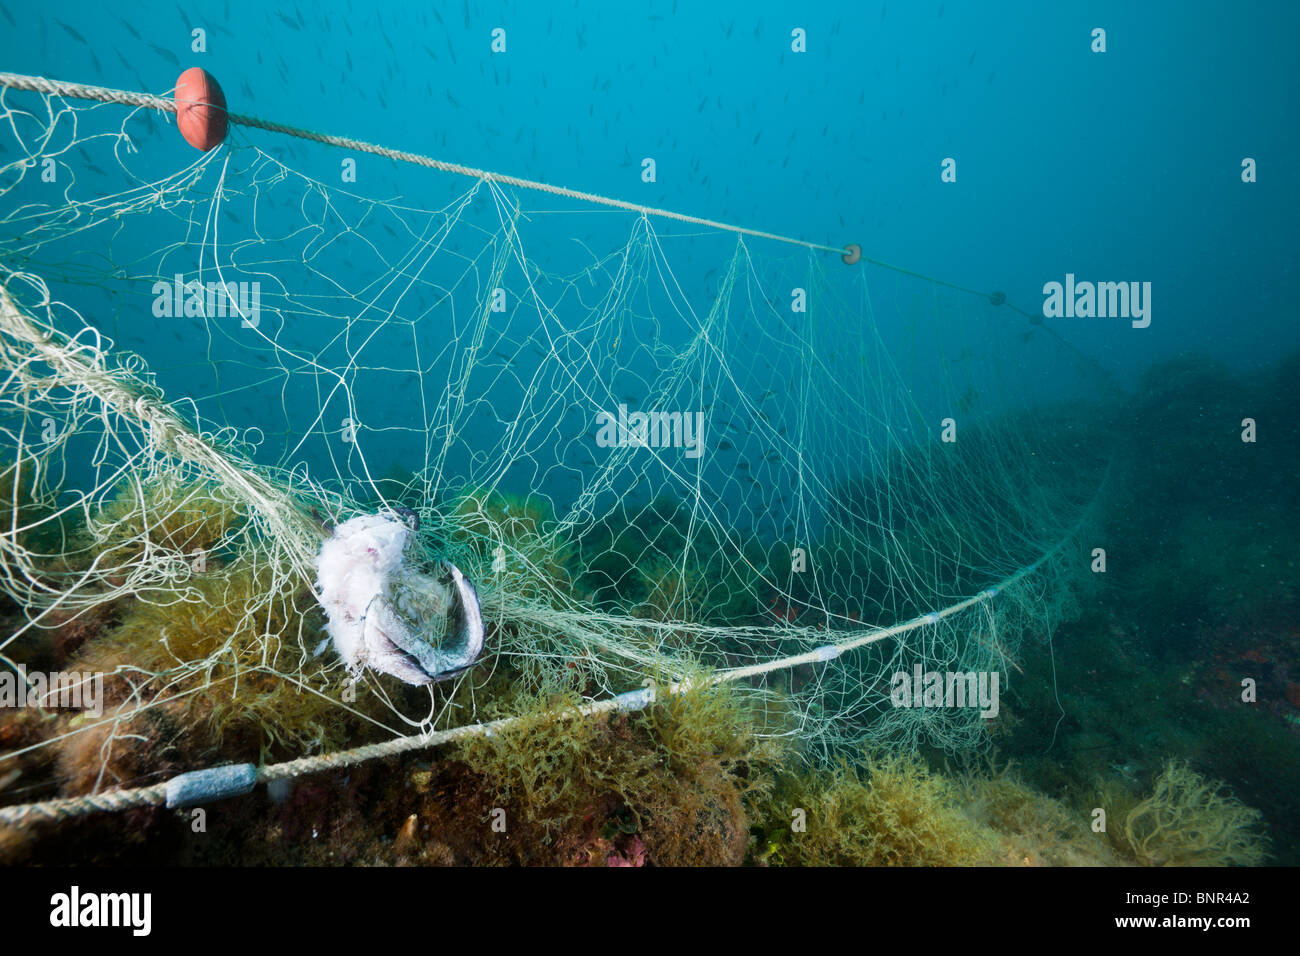 Fishing Net verloren über Riff, Cap de Creus, Costa Brava, Spanien Stockbild